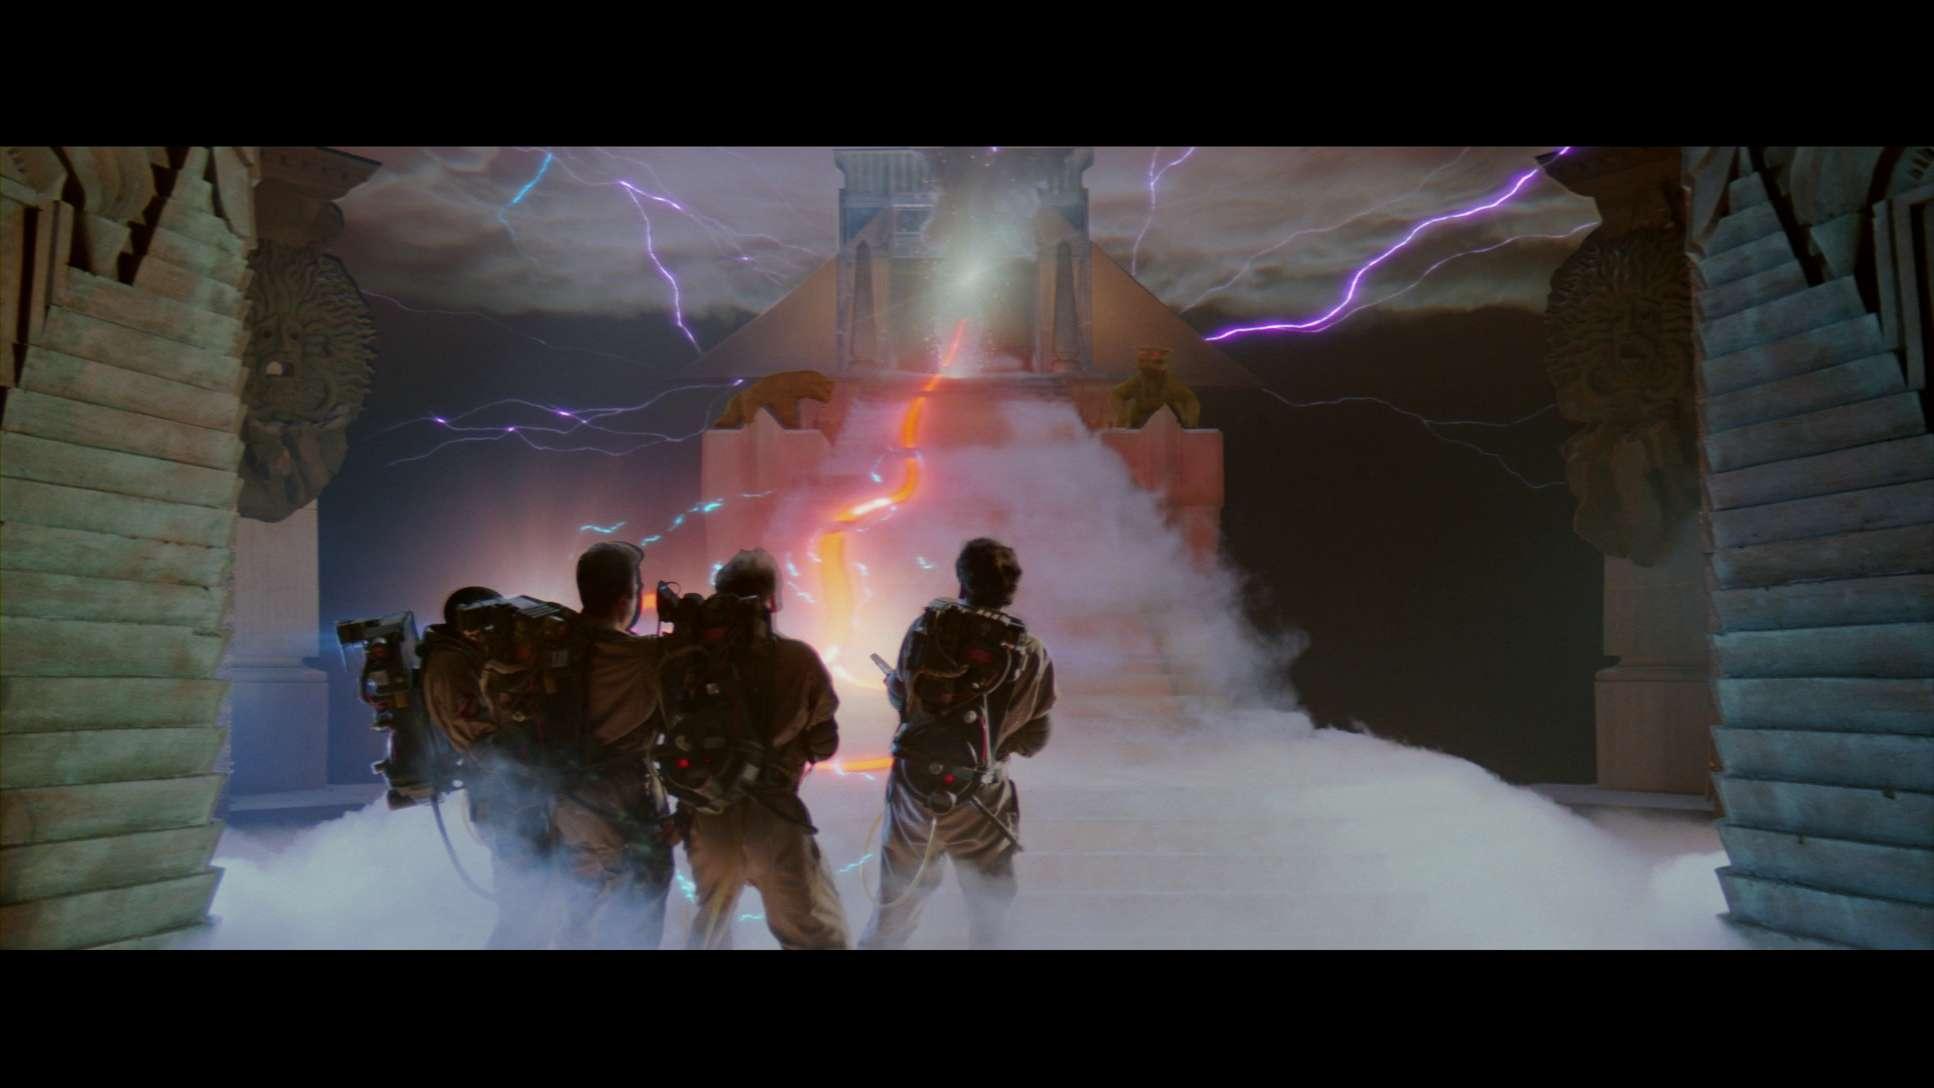 ghostbusters 4kultrahd bluray screenshots